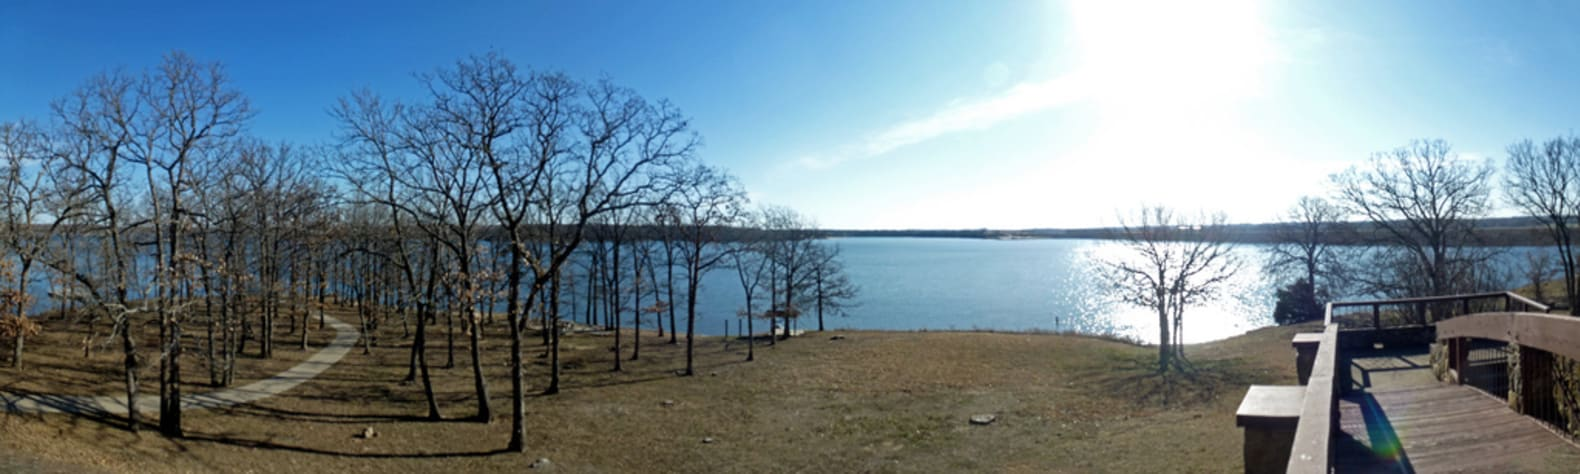 Pearson-Skubitz Big Hill Lake